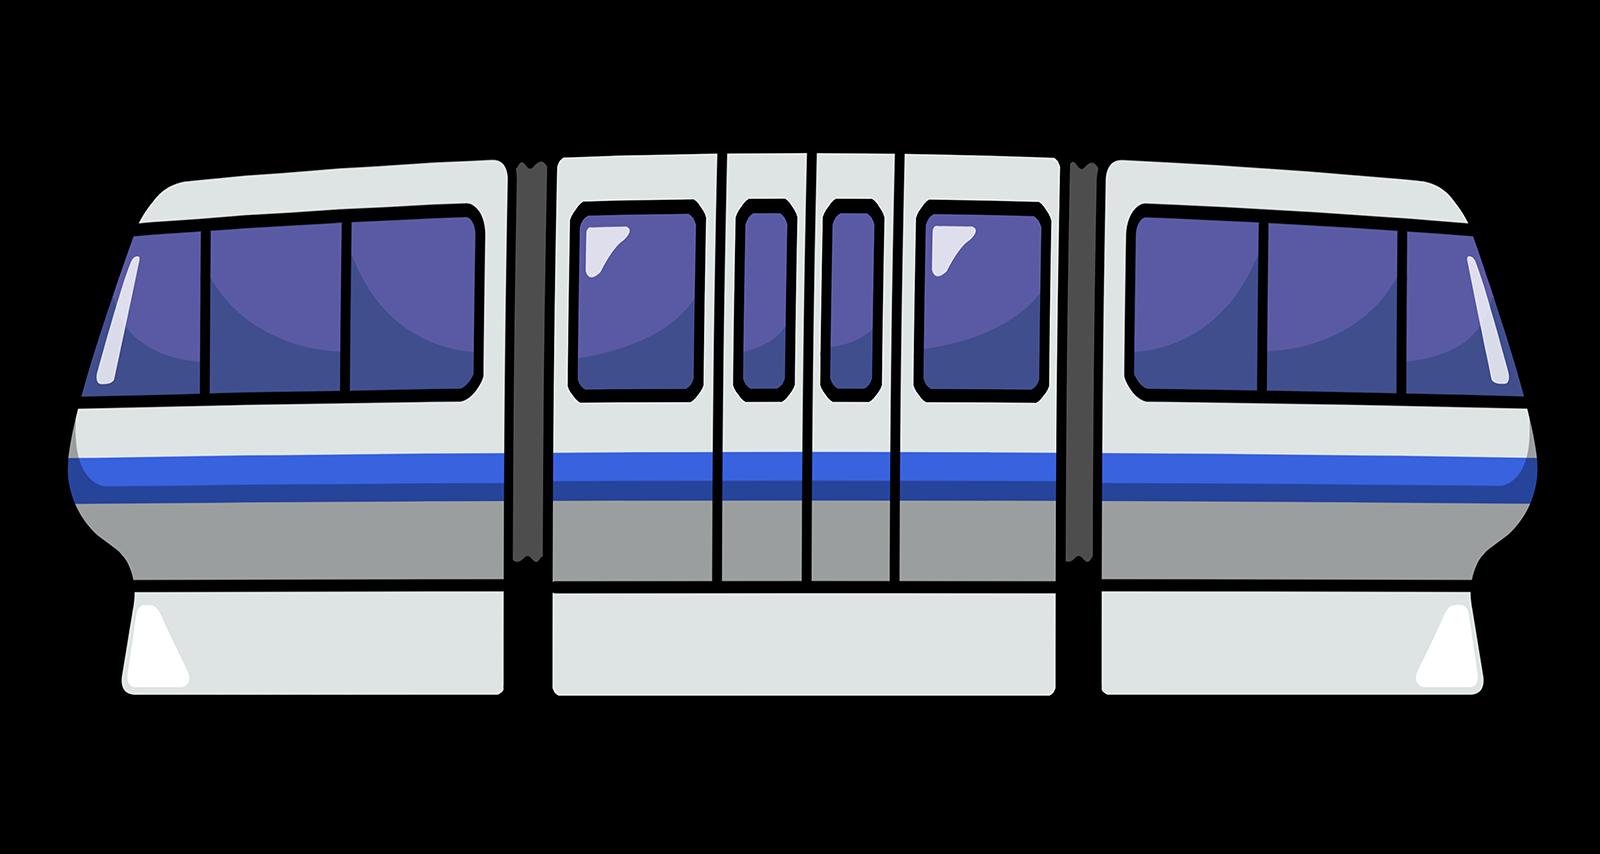 City train clipart graphic royalty free stock Cartoon Rail | Free download best Cartoon Rail on ClipArtMag.com graphic royalty free stock